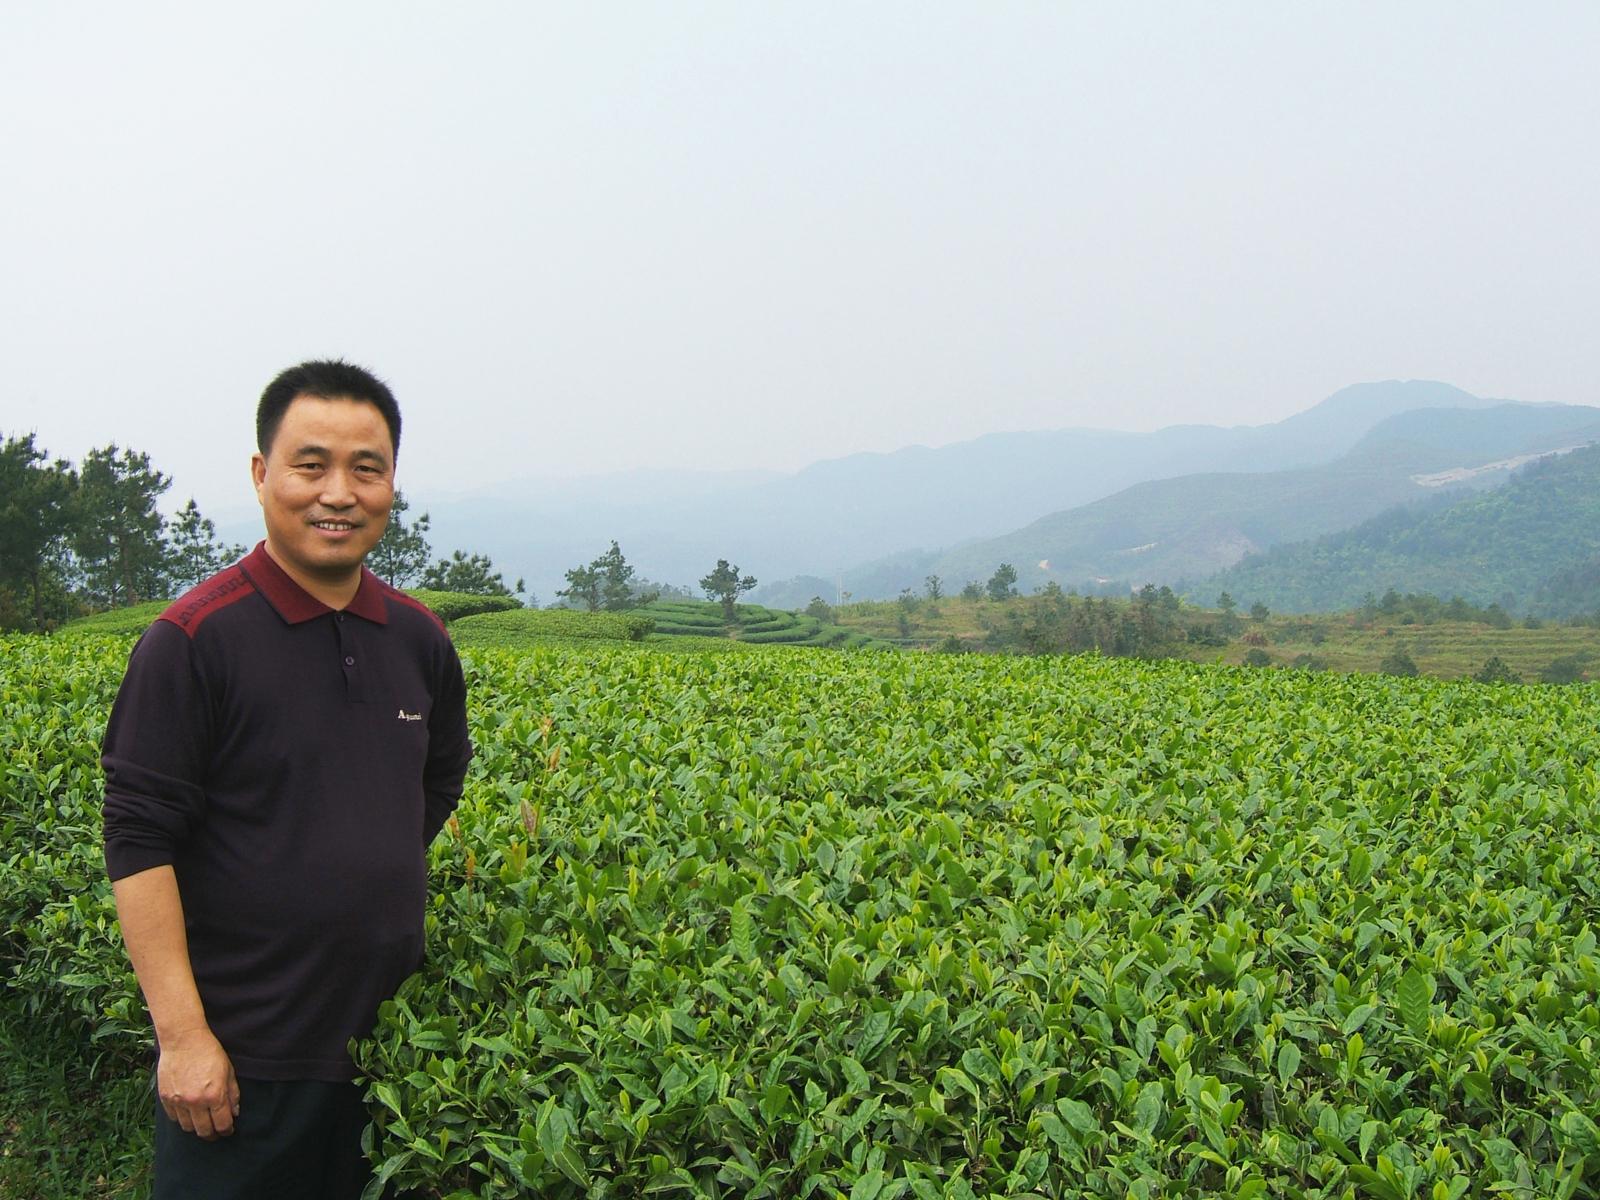 M. Zhang, producteur dans le Fujian (Chine)